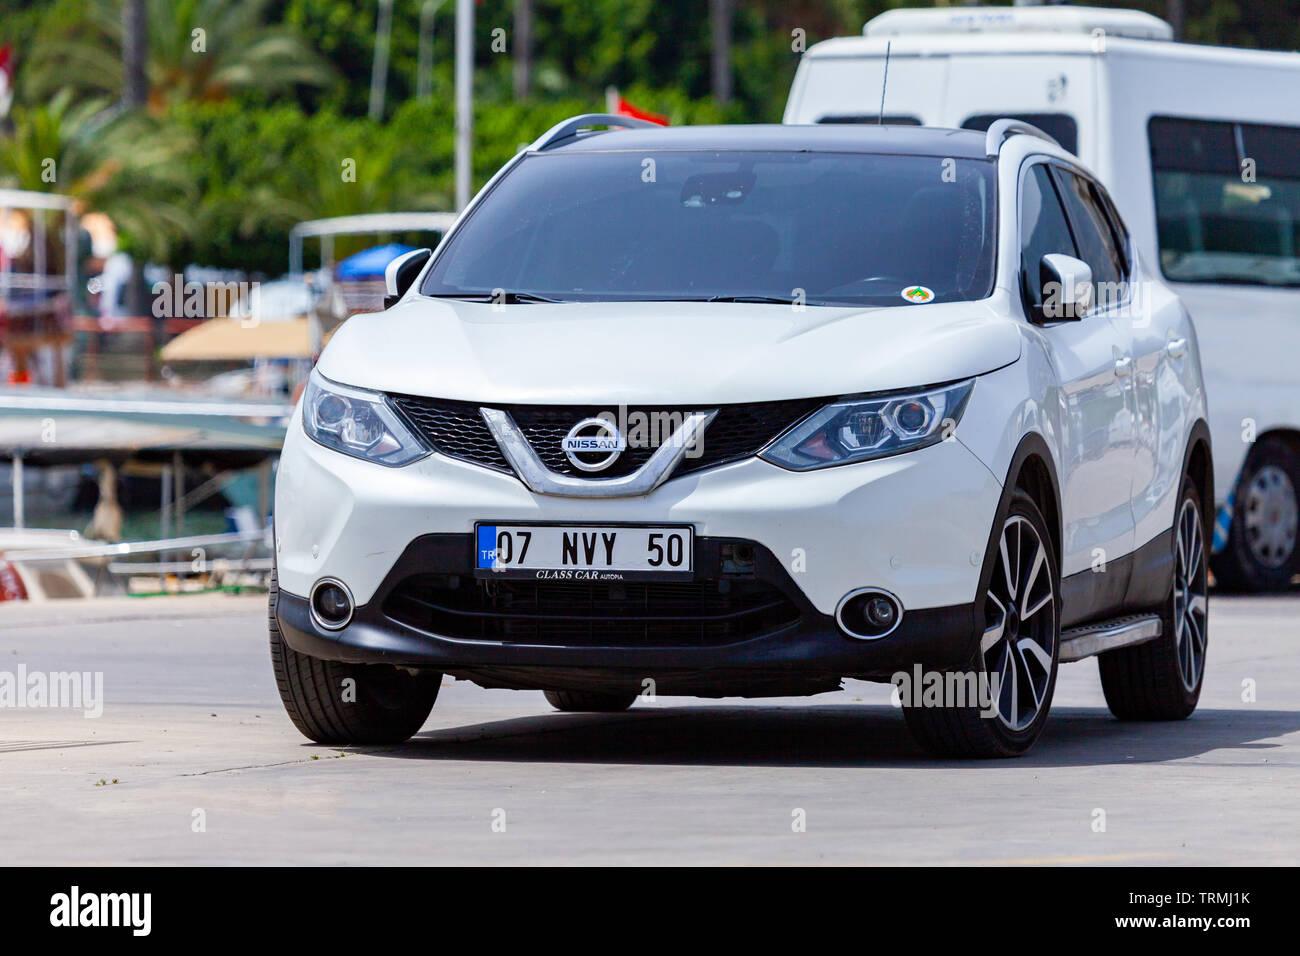 ALANYA / TURKEY - JUNE 3, 2019: Nissan Qashqai stands on a street in Alanya, Turkey. - Stock Image